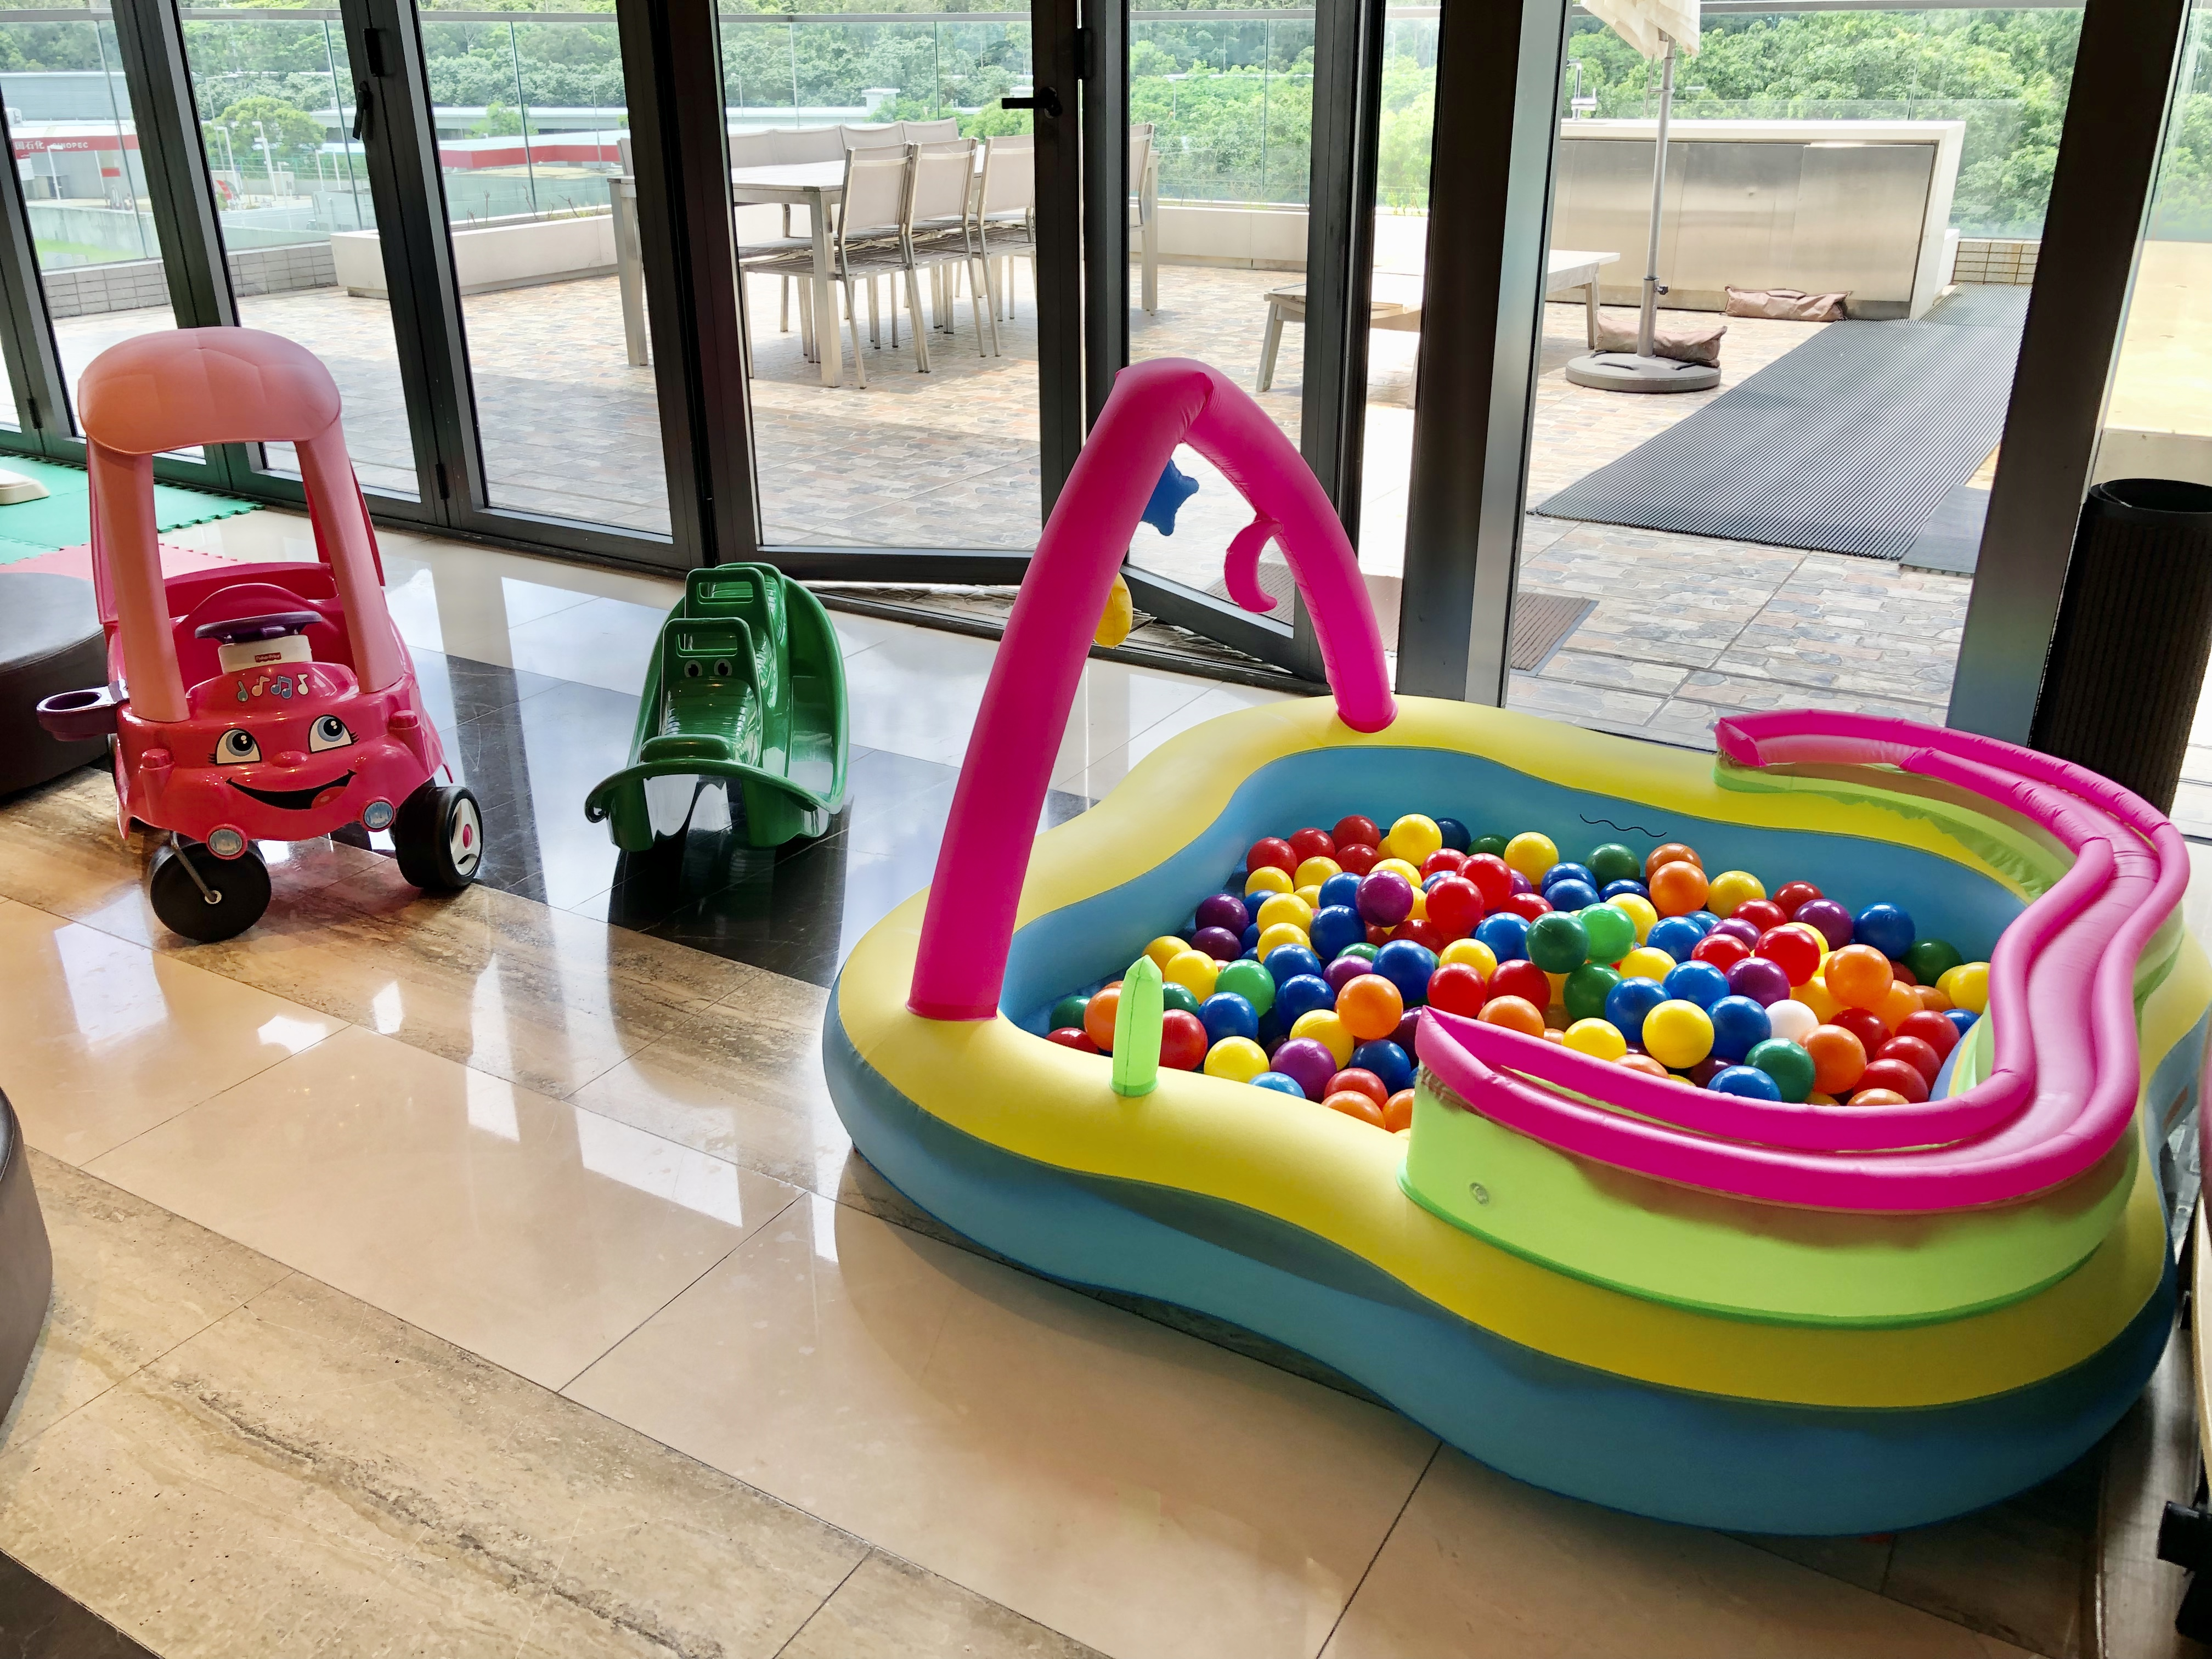 Rainbow Rolling Play Center